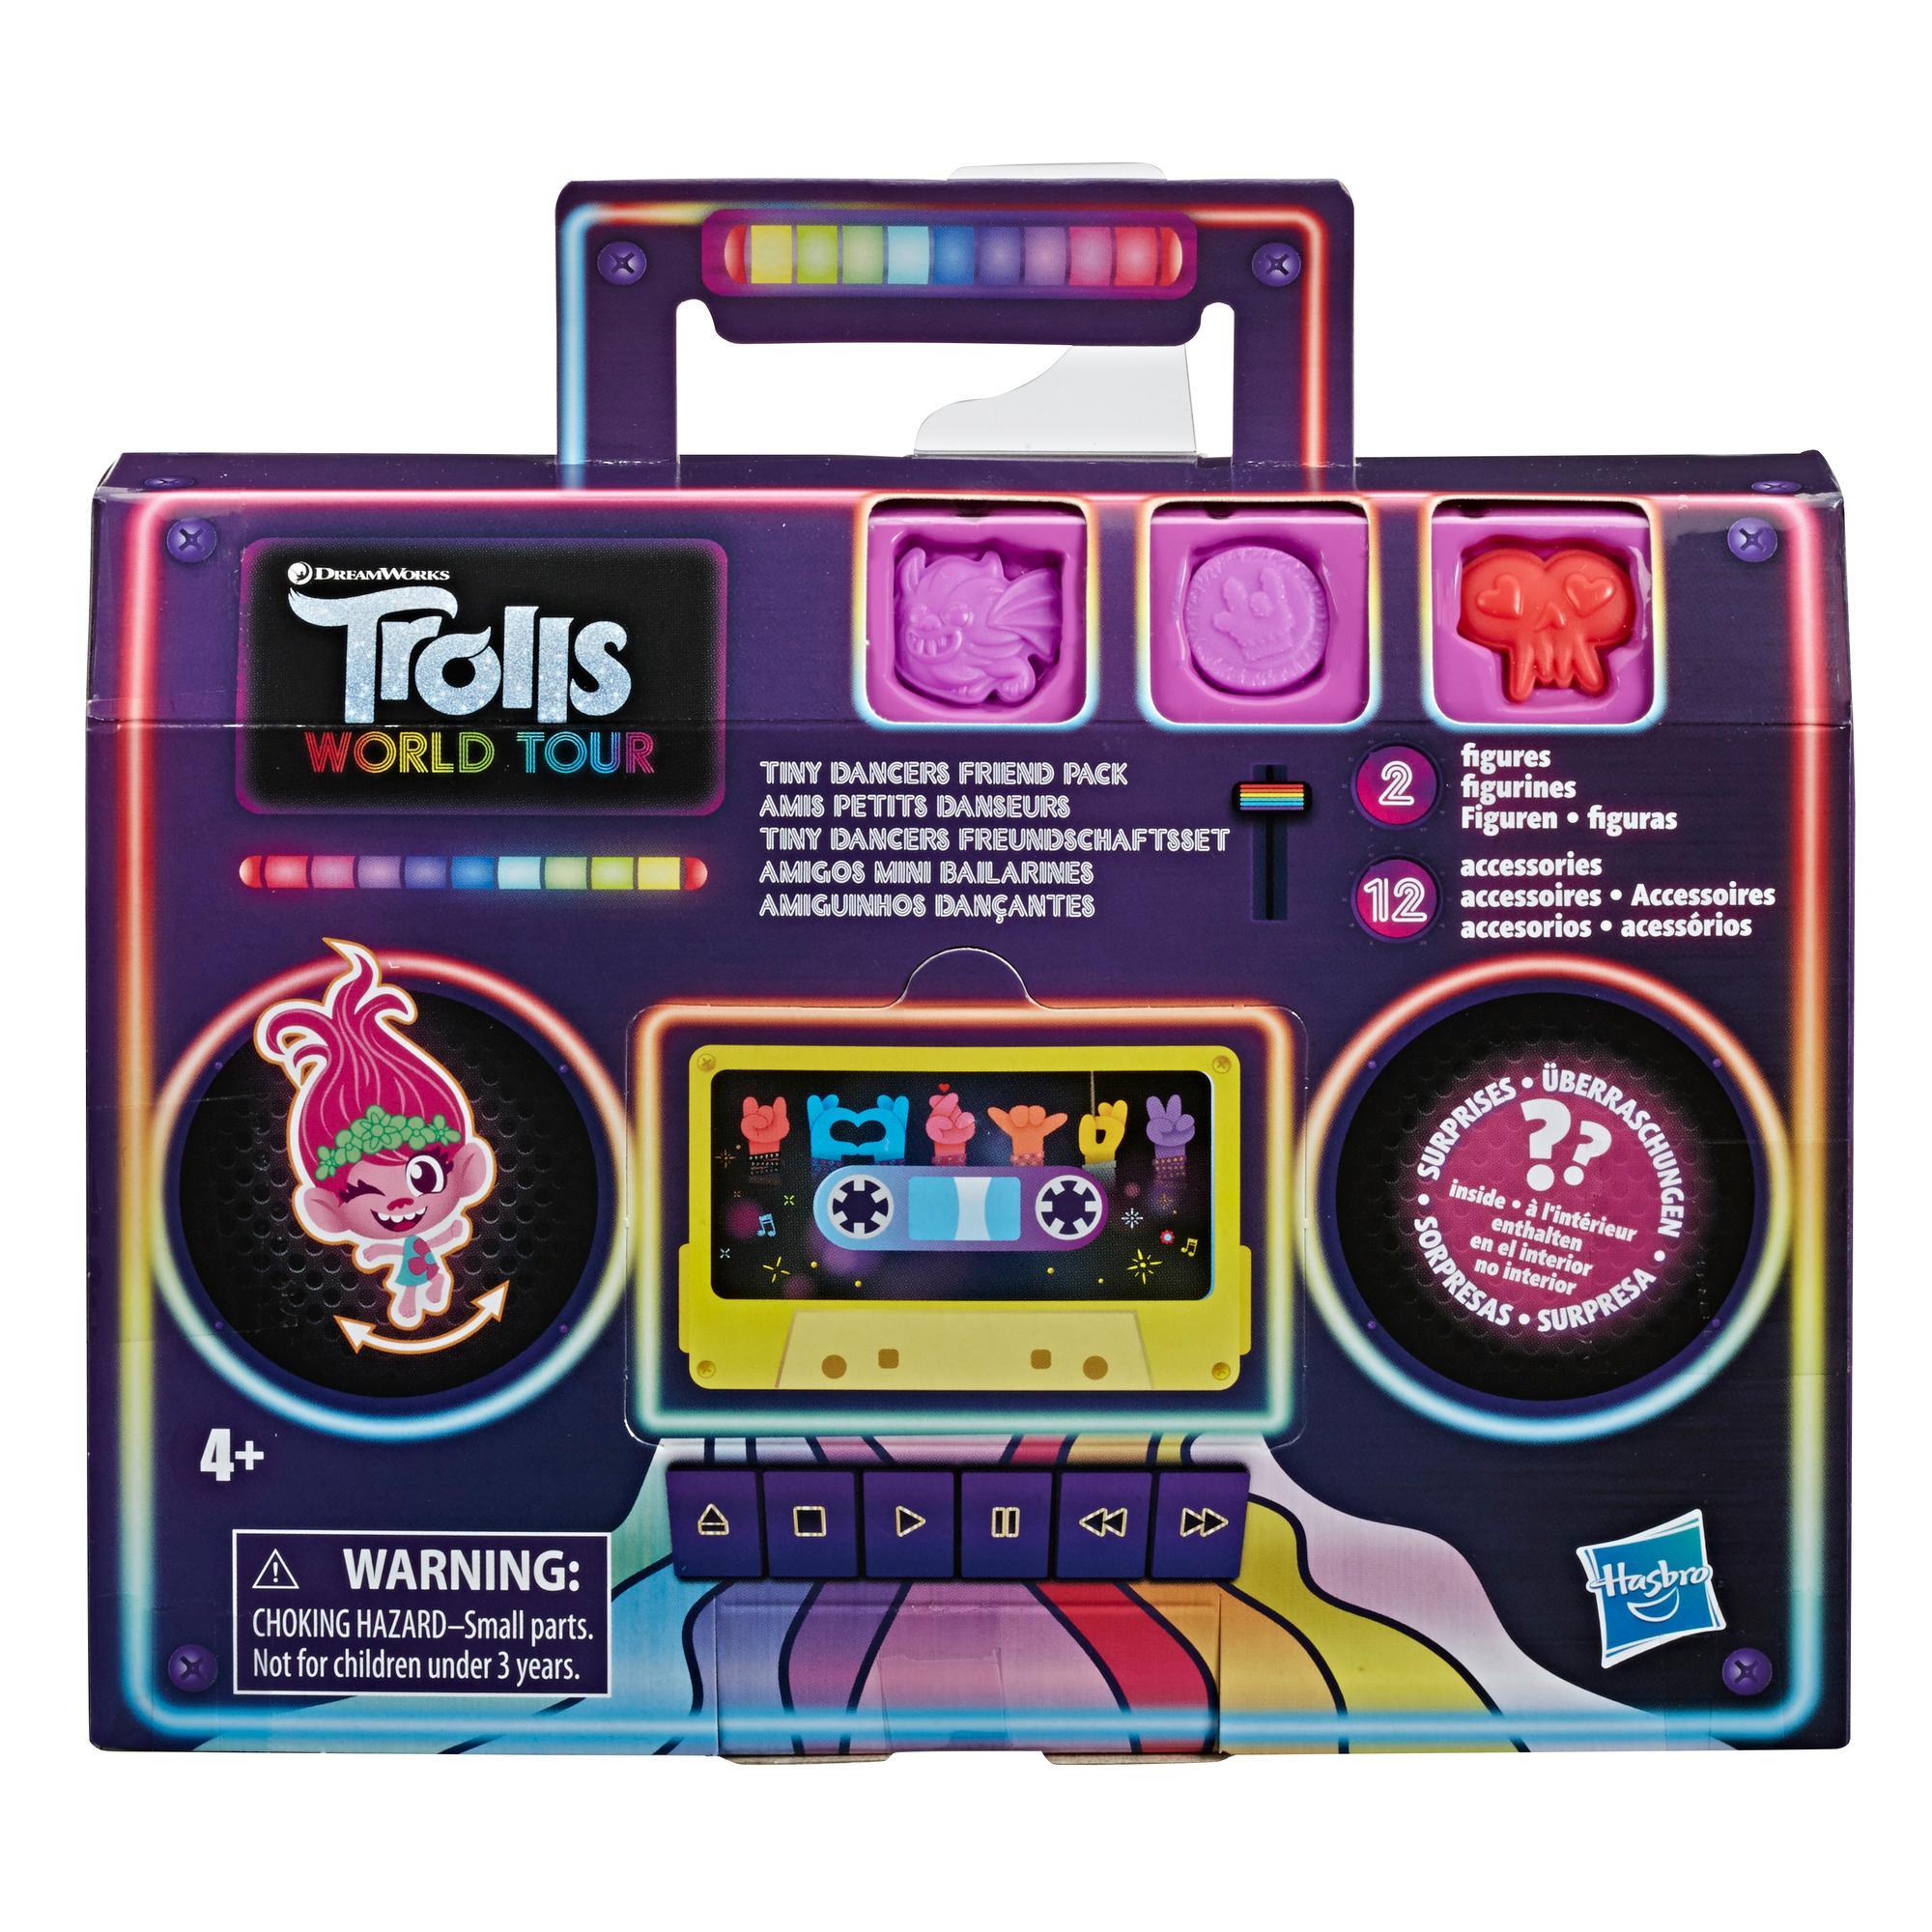 Les Trolls de DreamWorks, Amis petits danseurs, 2Petits danseurs, 2bracelets, 10charms, du film Les Trolls 2